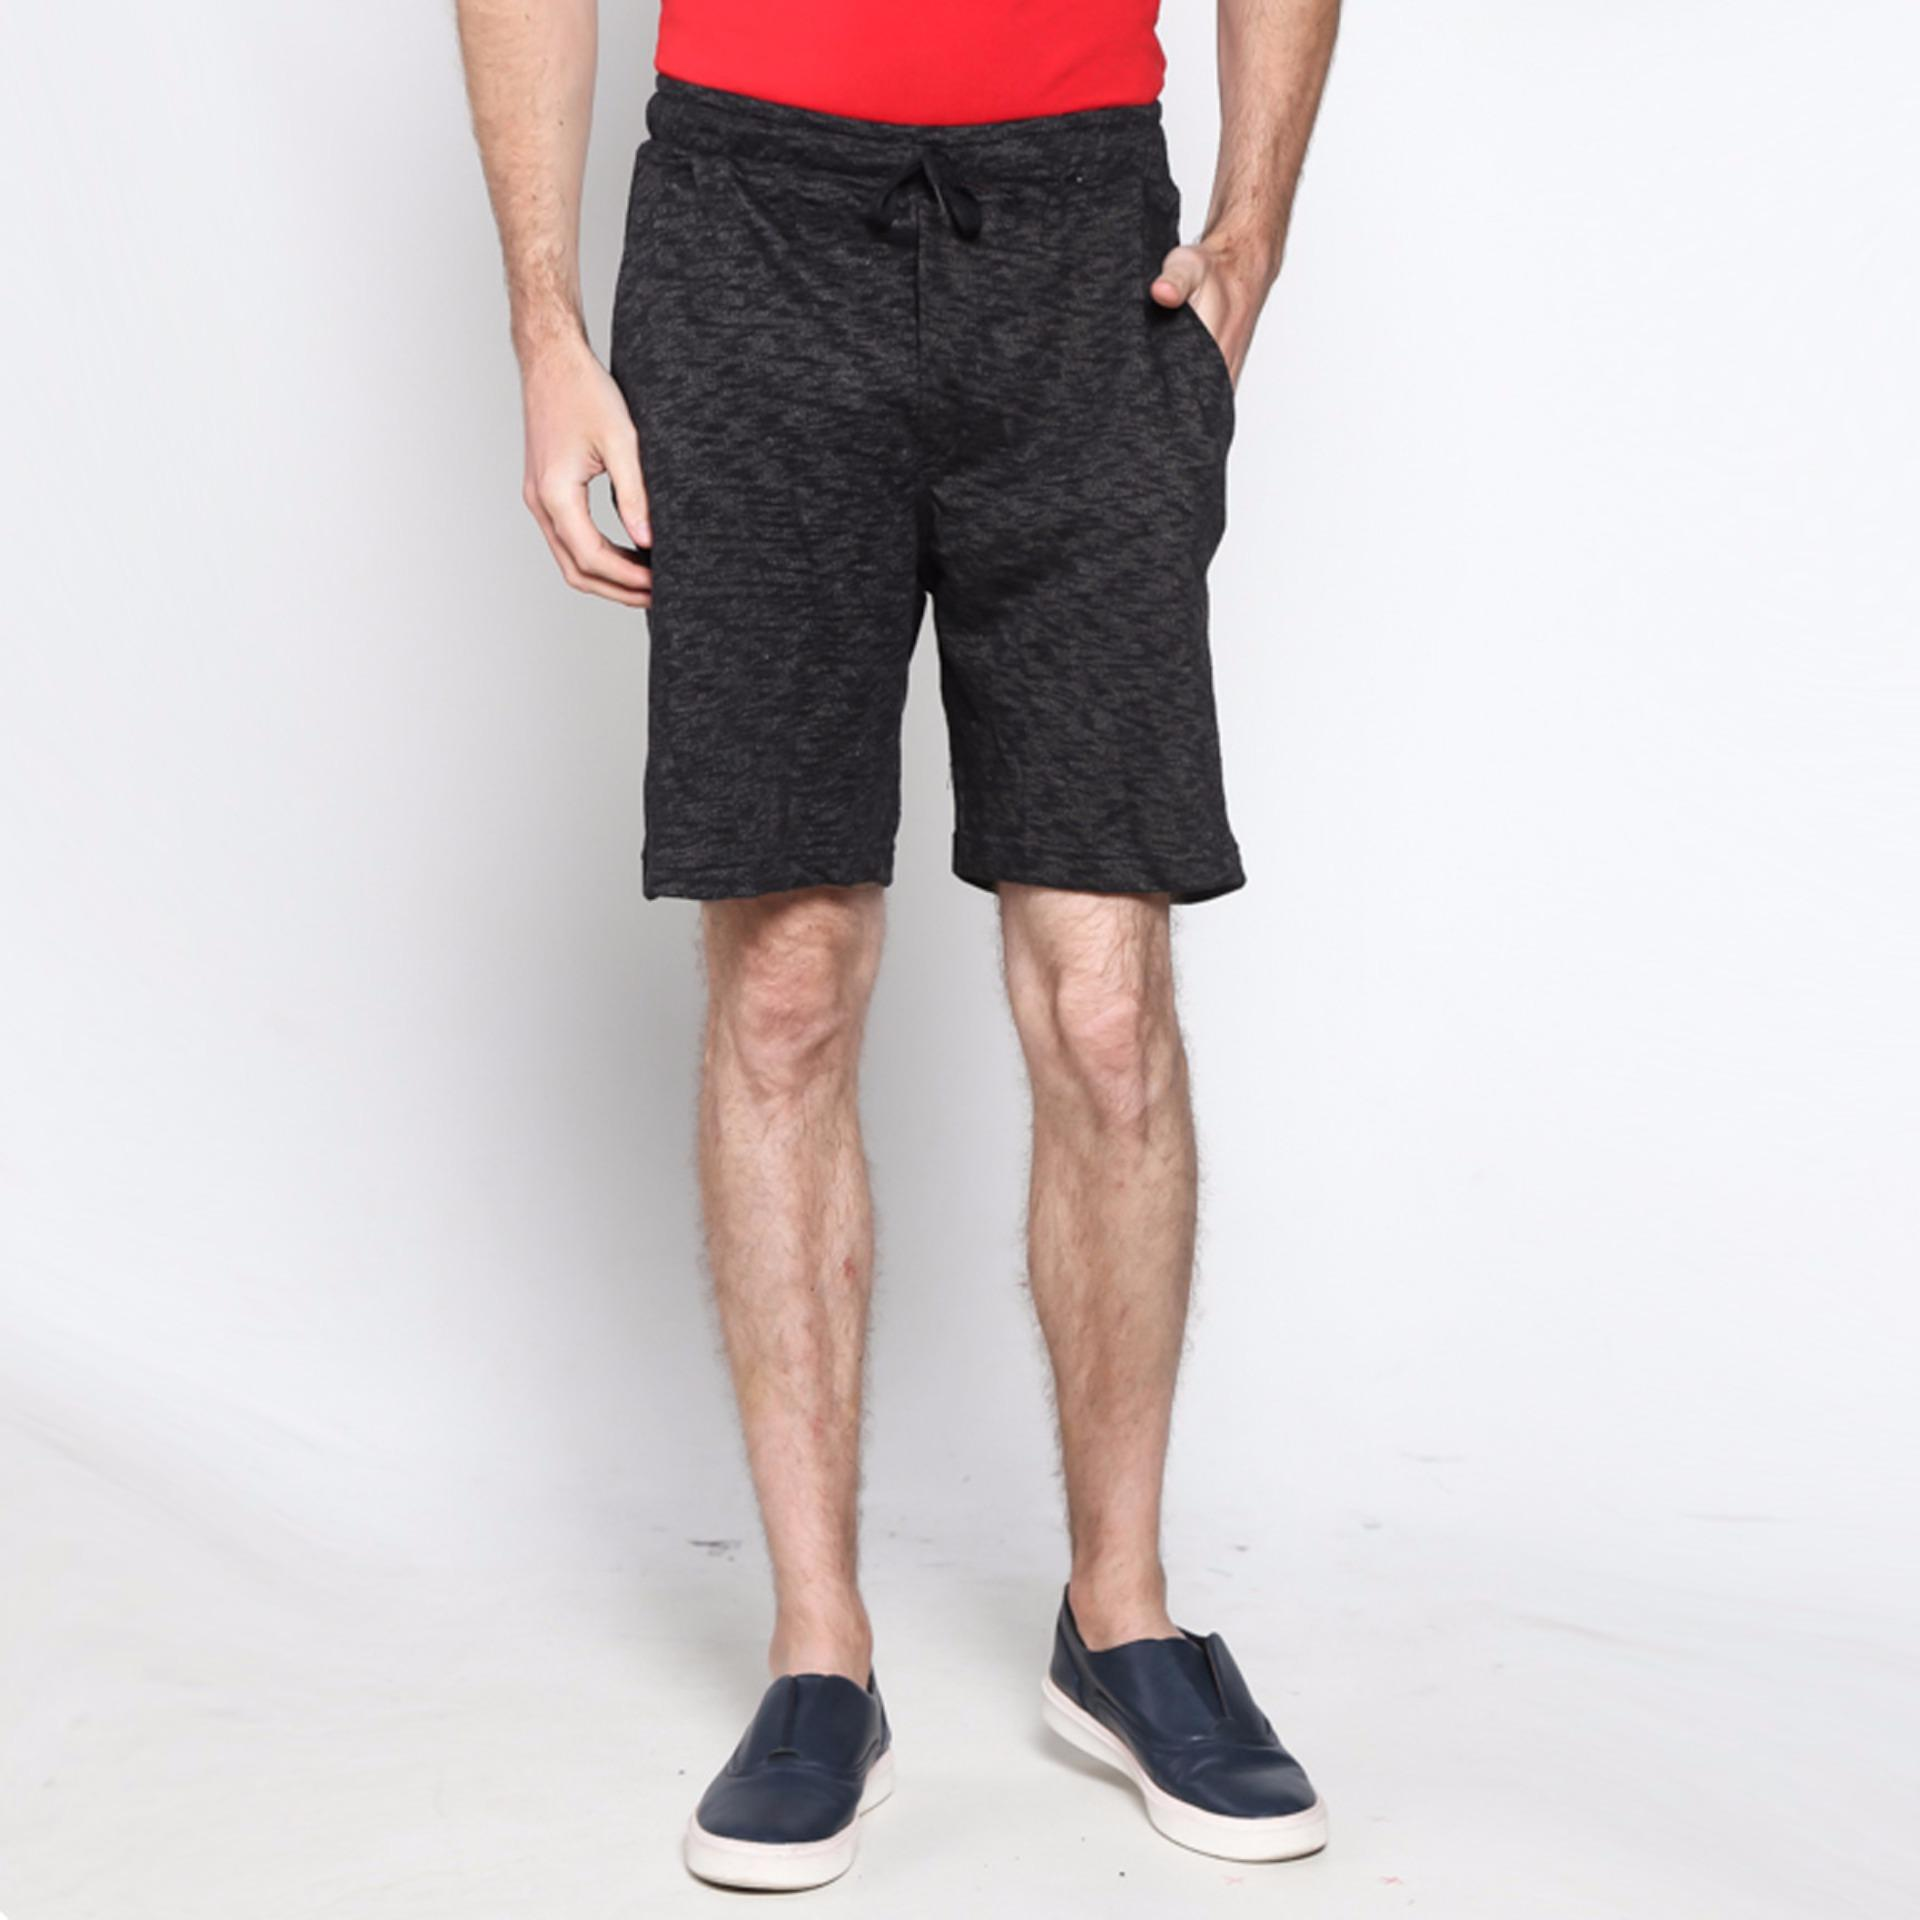 Vm Celana Pendek Pria Terry Santai Hitam Short Pant Spec Aglint Cargo Coklat